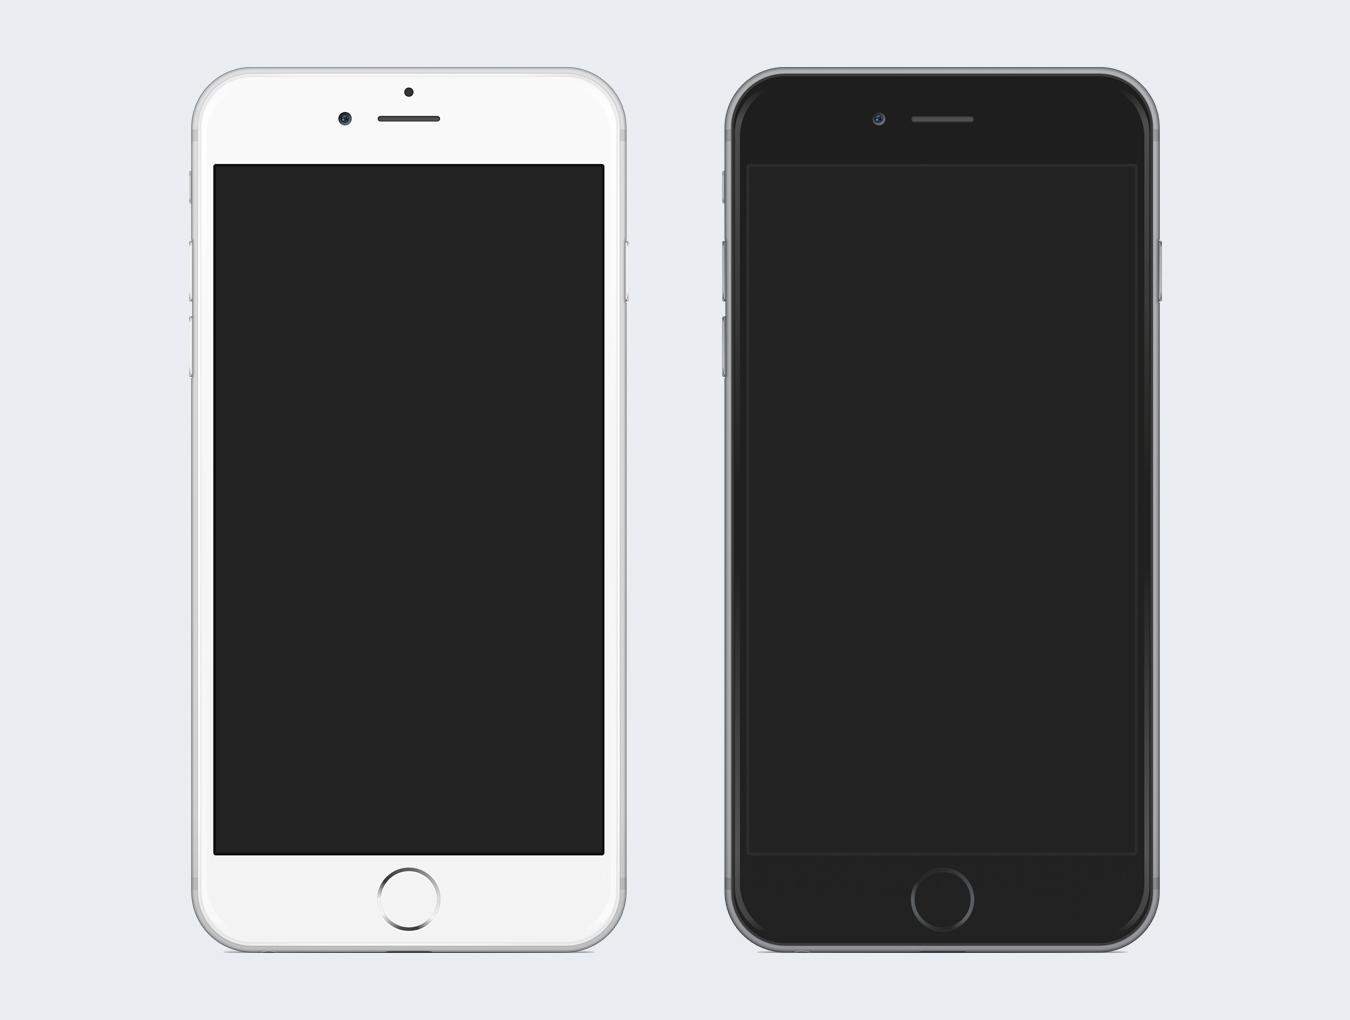 iphone 6 plus template. Black Bedroom Furniture Sets. Home Design Ideas